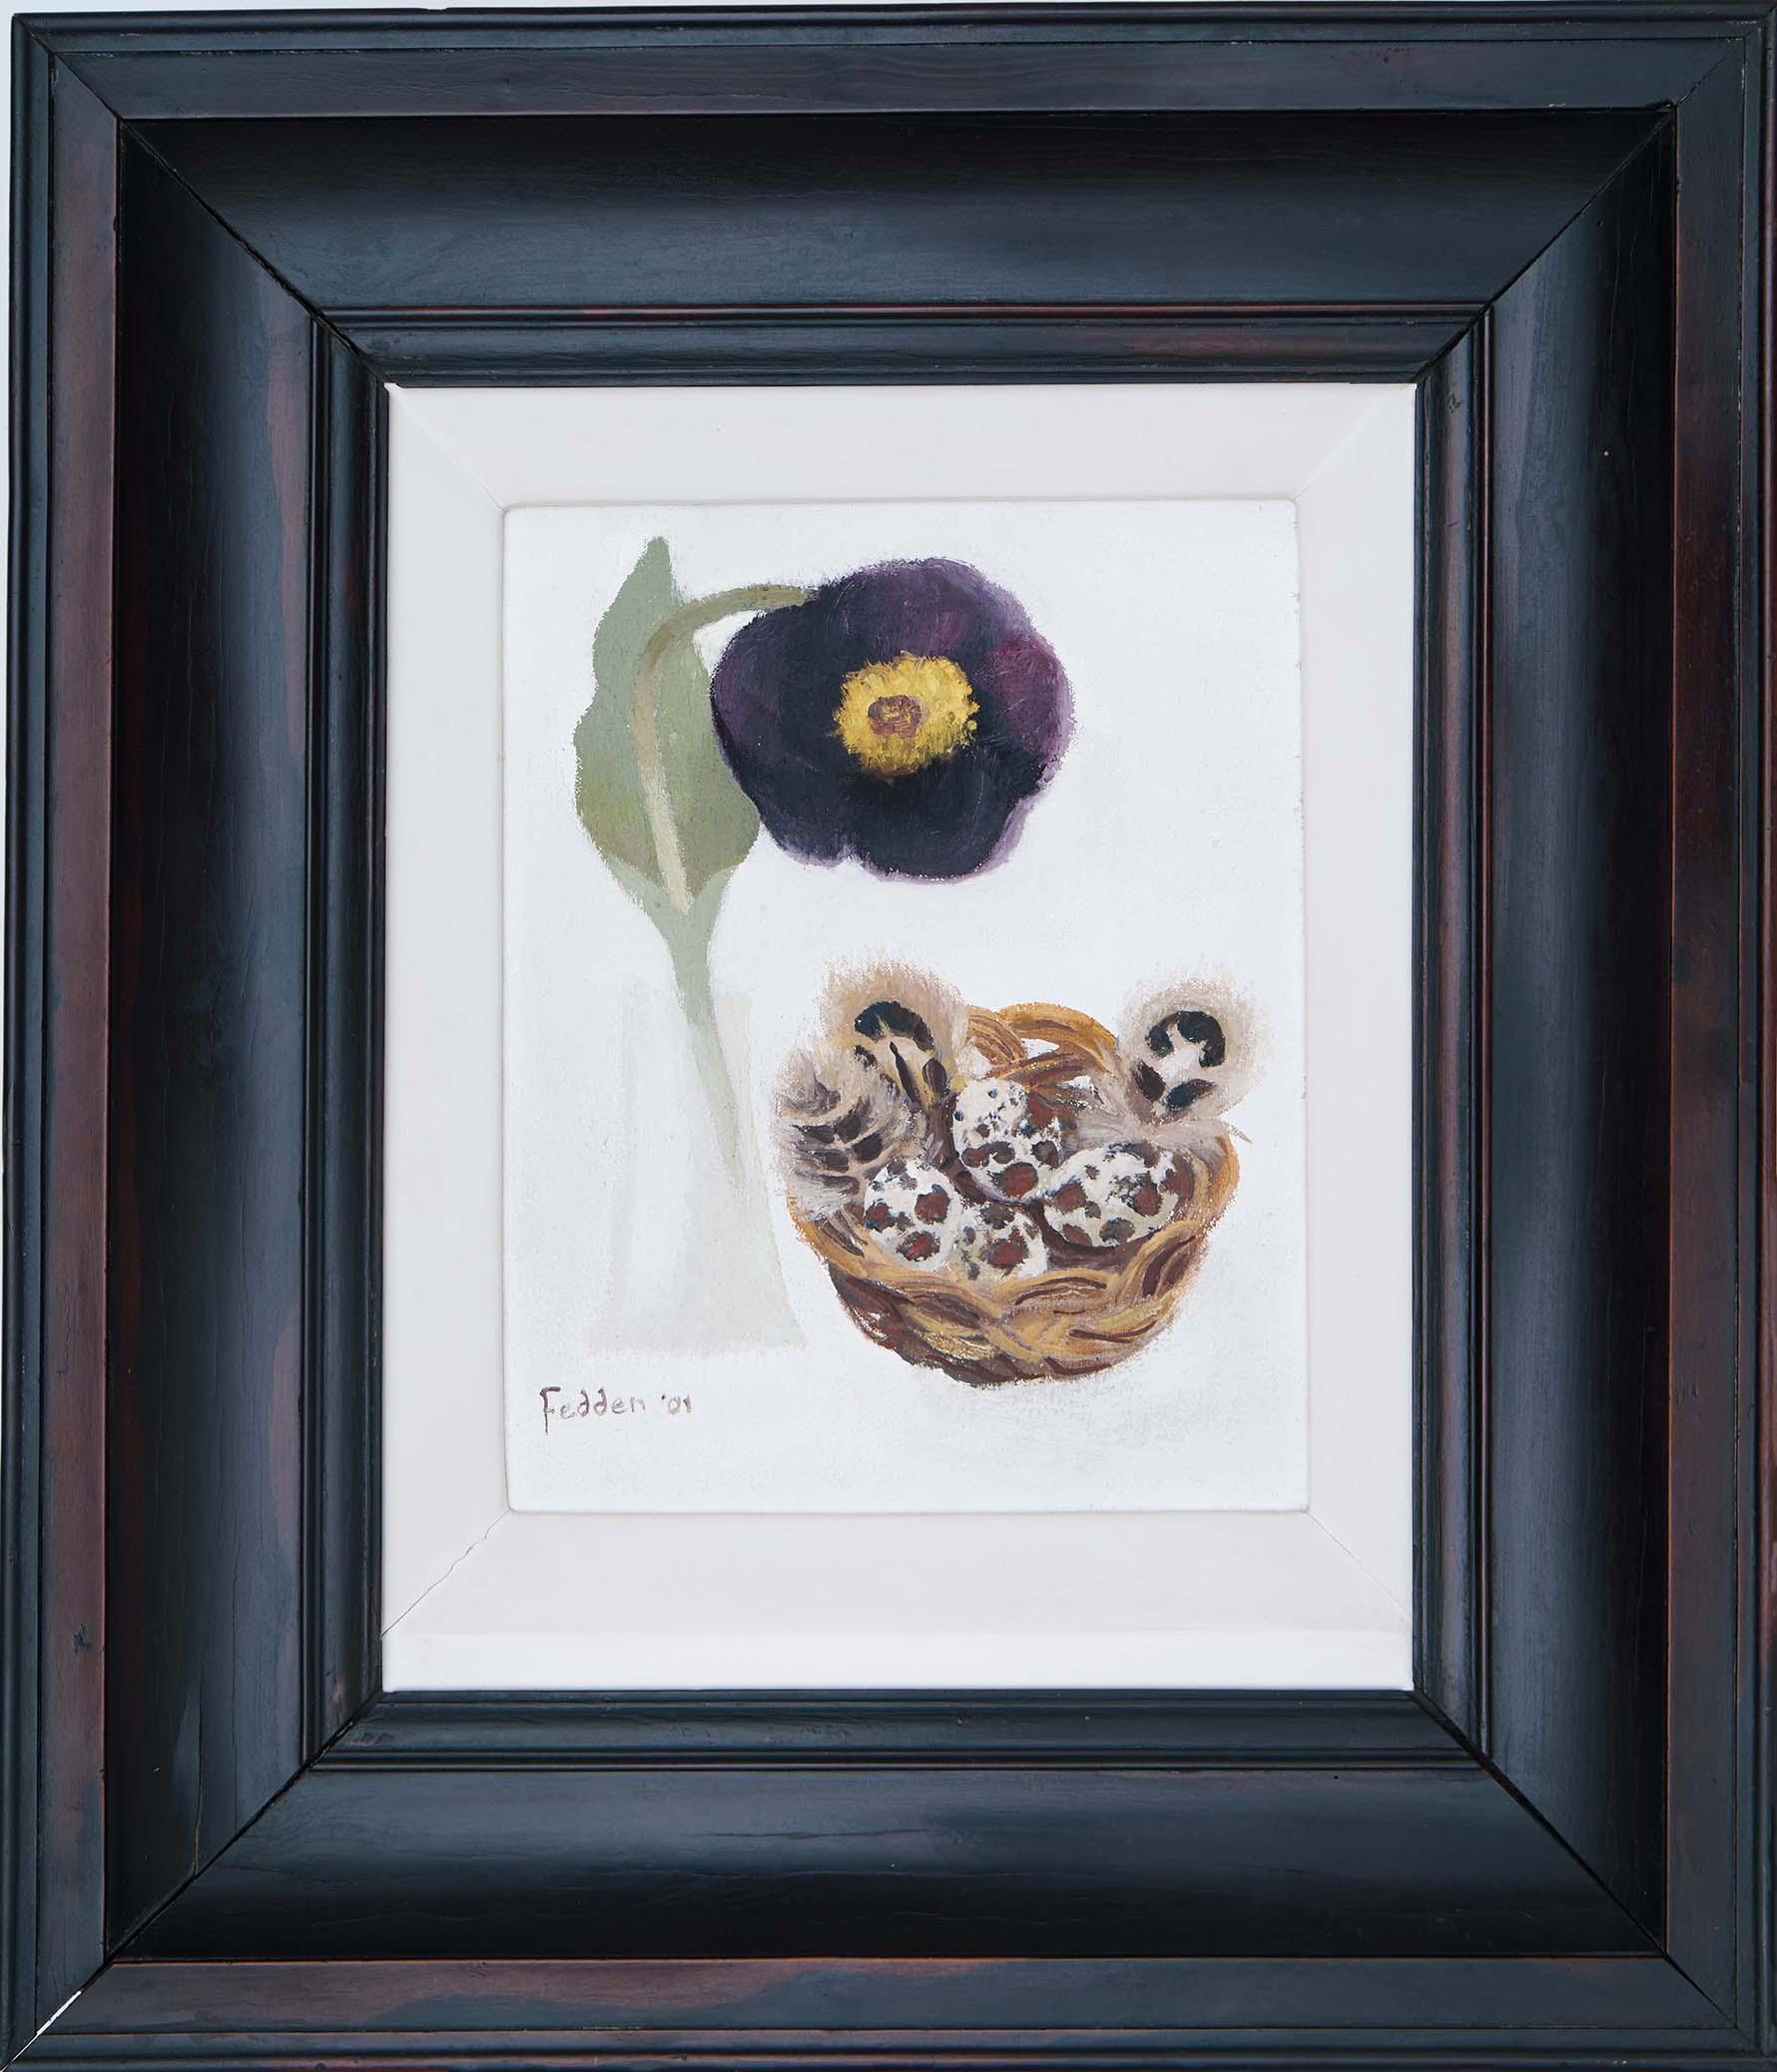 mary-fedden-tulip-and-eggs-frame